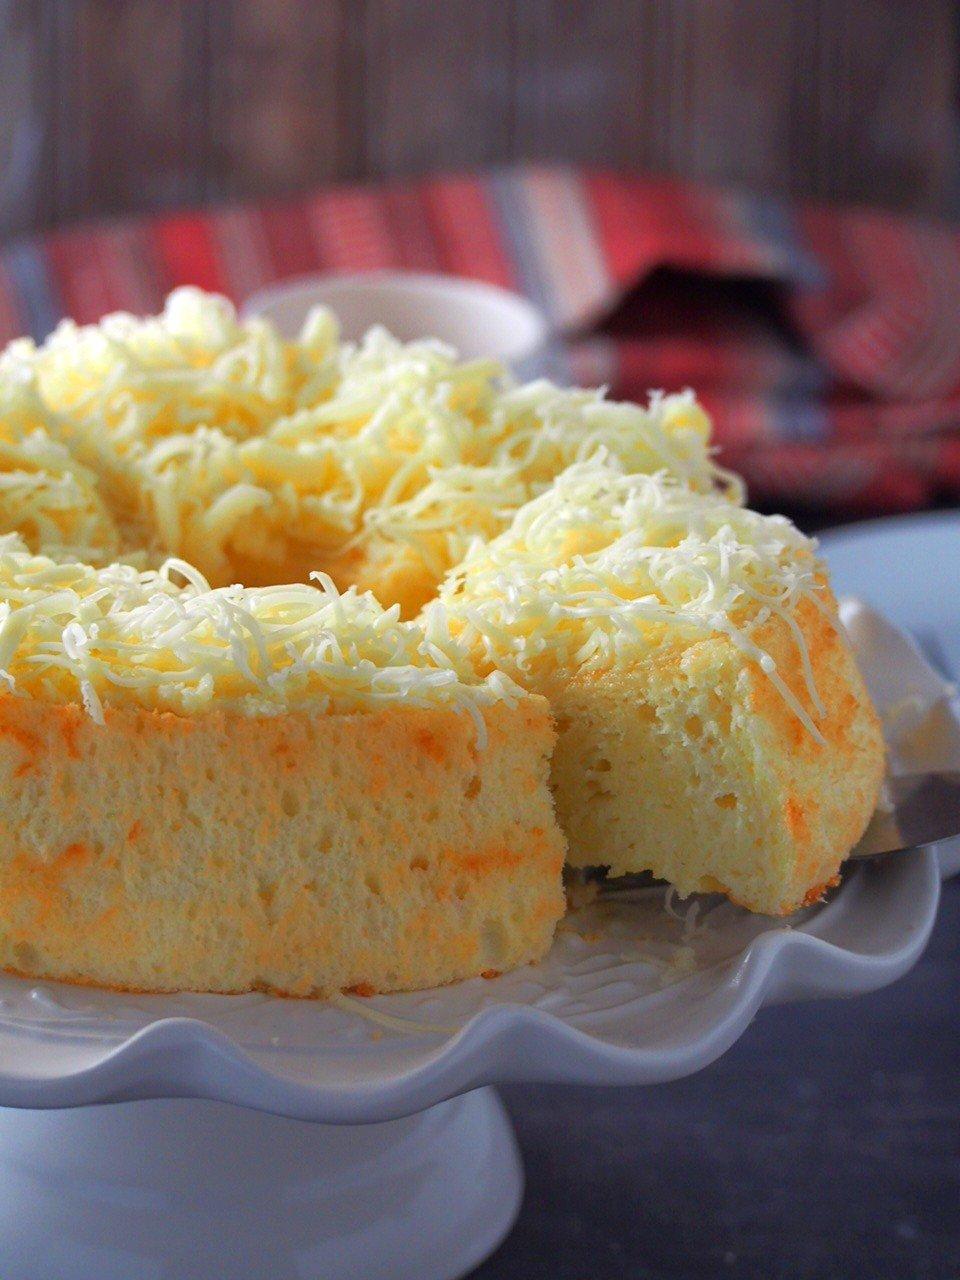 Cheese Chiffon Cake with one cut slice.